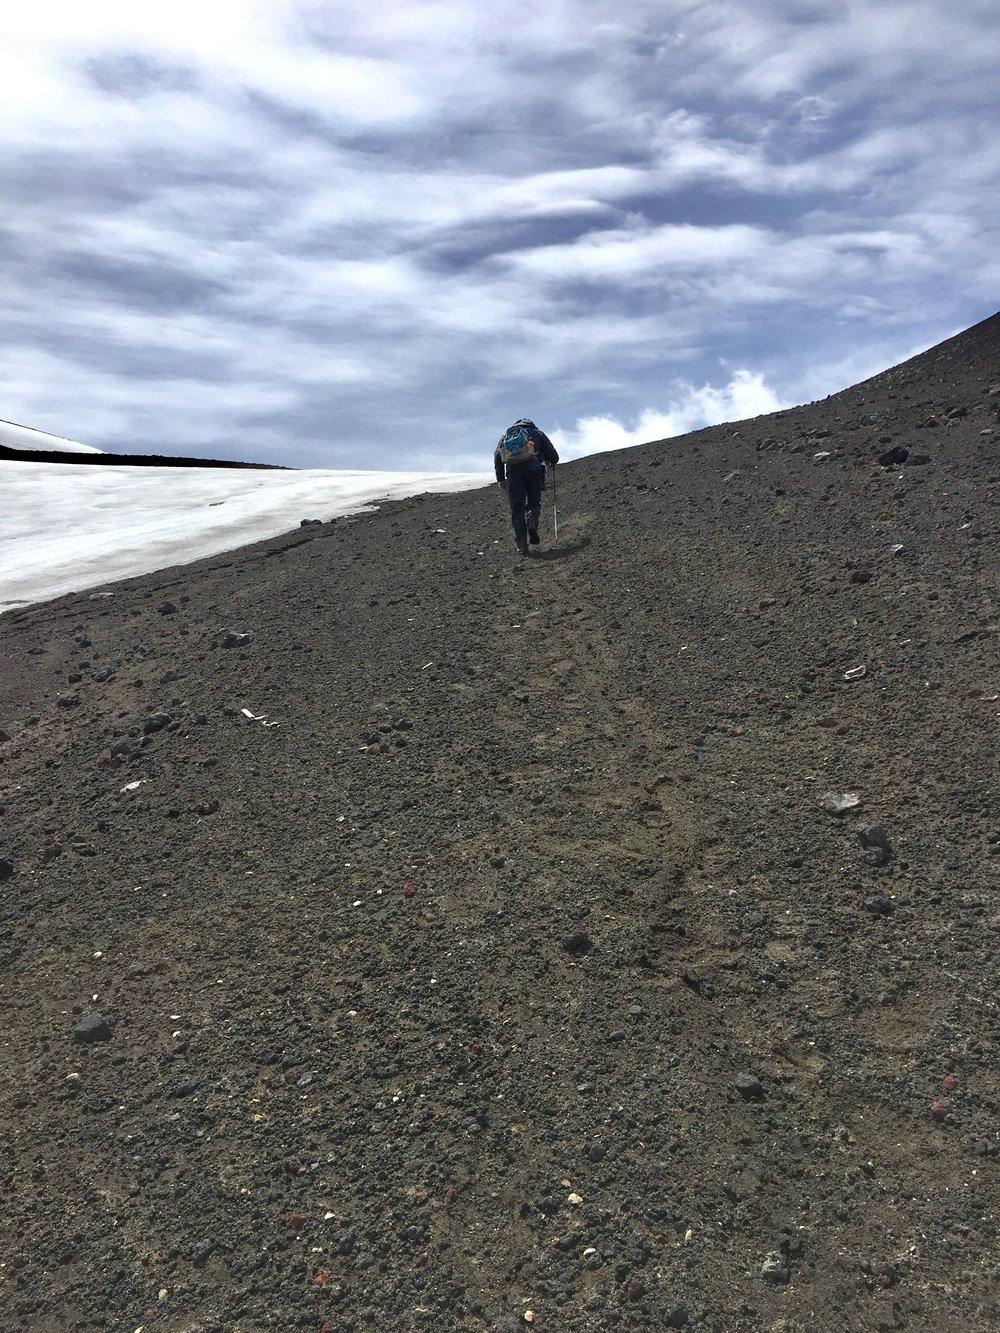 Frank climbing